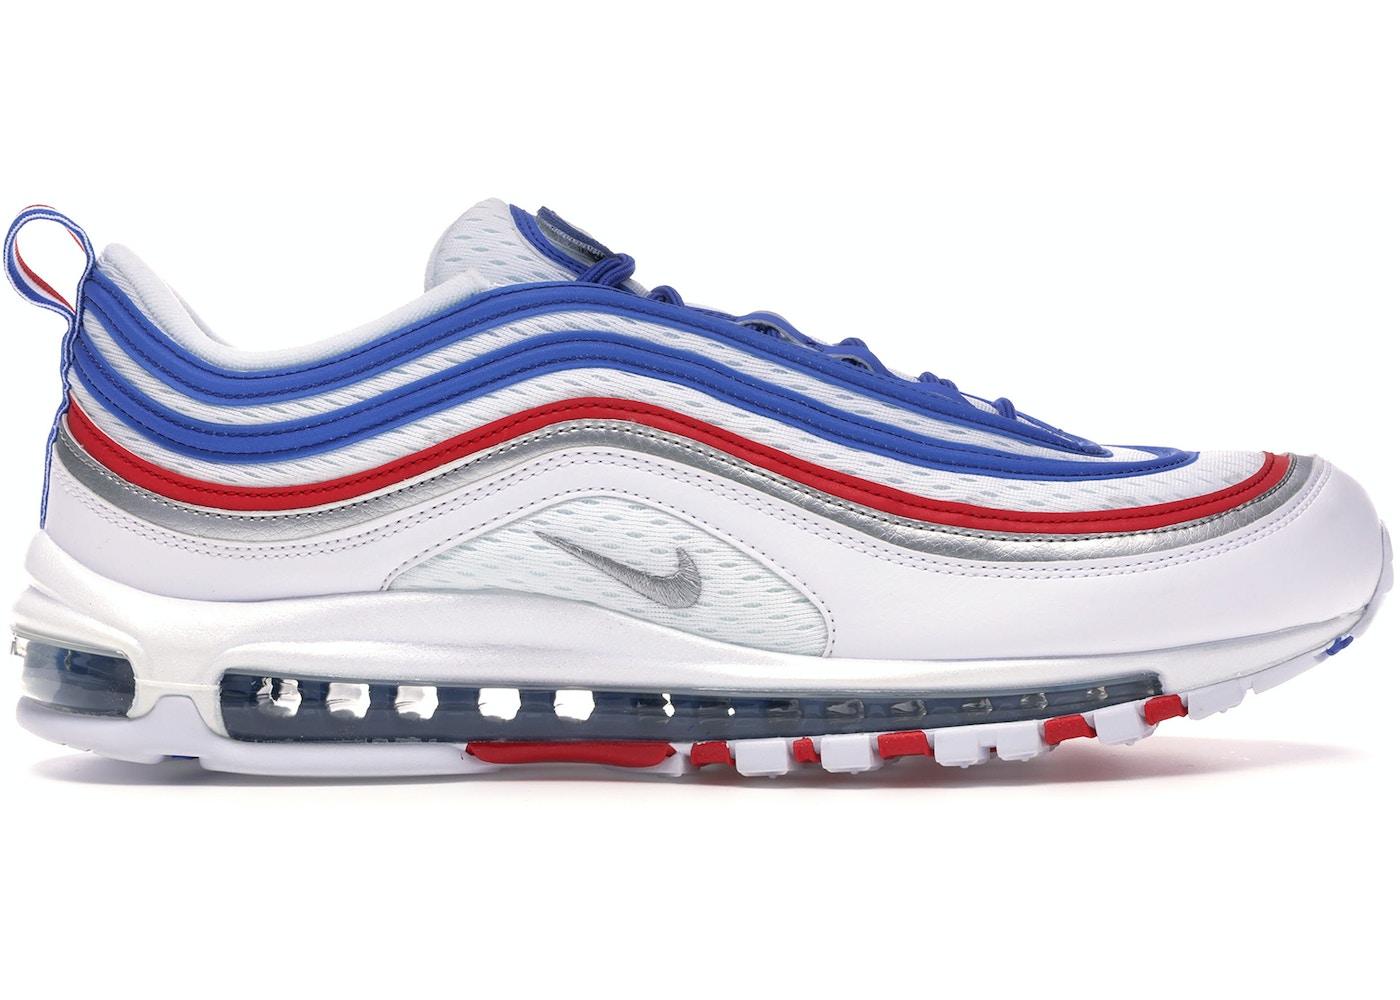 detailed look fa08b dec90 Buy Nike Air Max 97 Shoes & Deadstock Sneakers